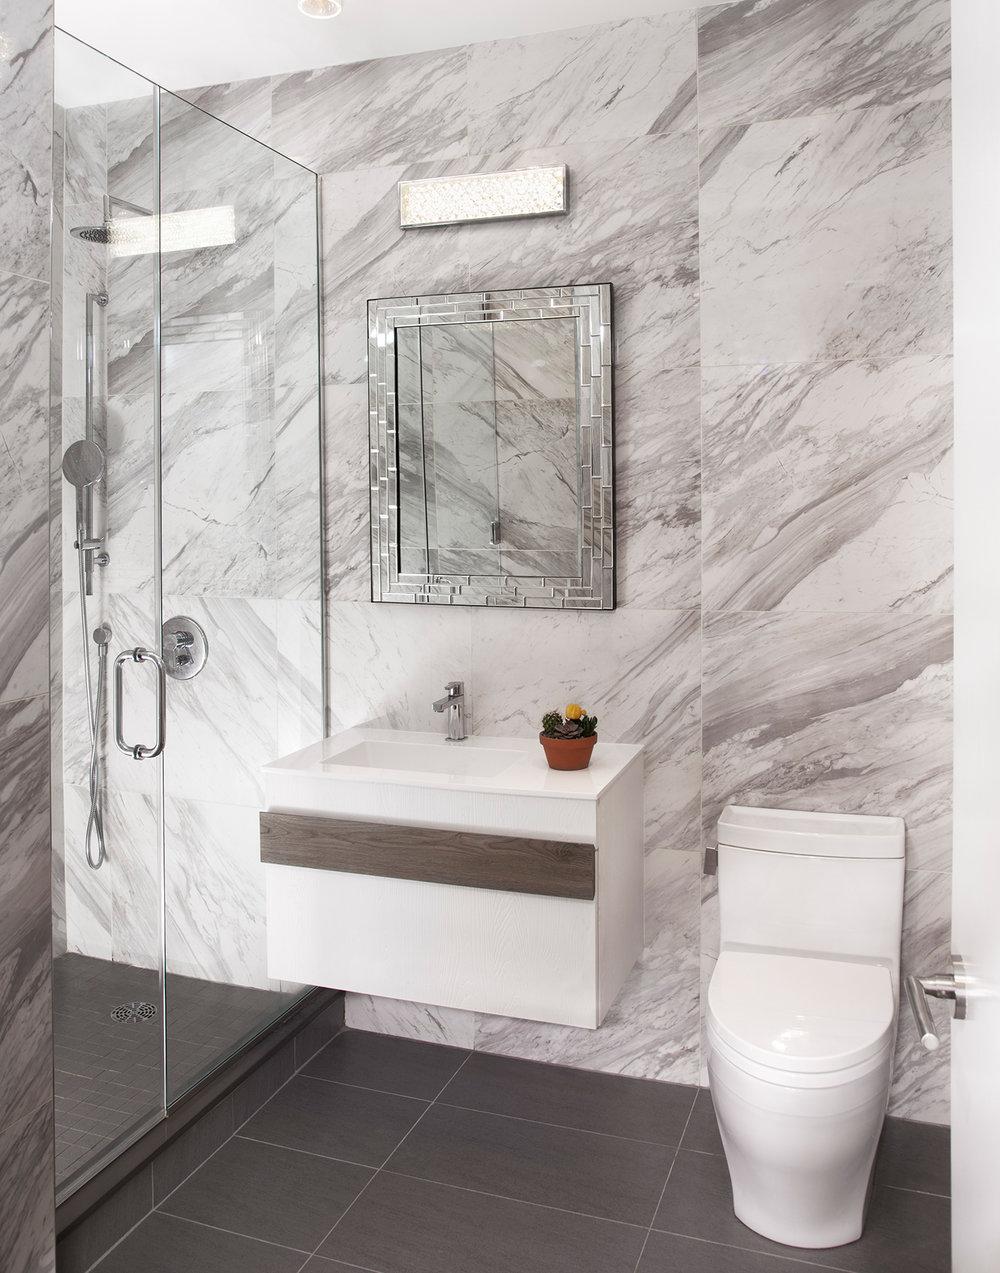 interior Design Photography in New York By Jonathan R. Bevkerman Design By Evelyn Benatar 7th Ave_Bathroom 06.jpg